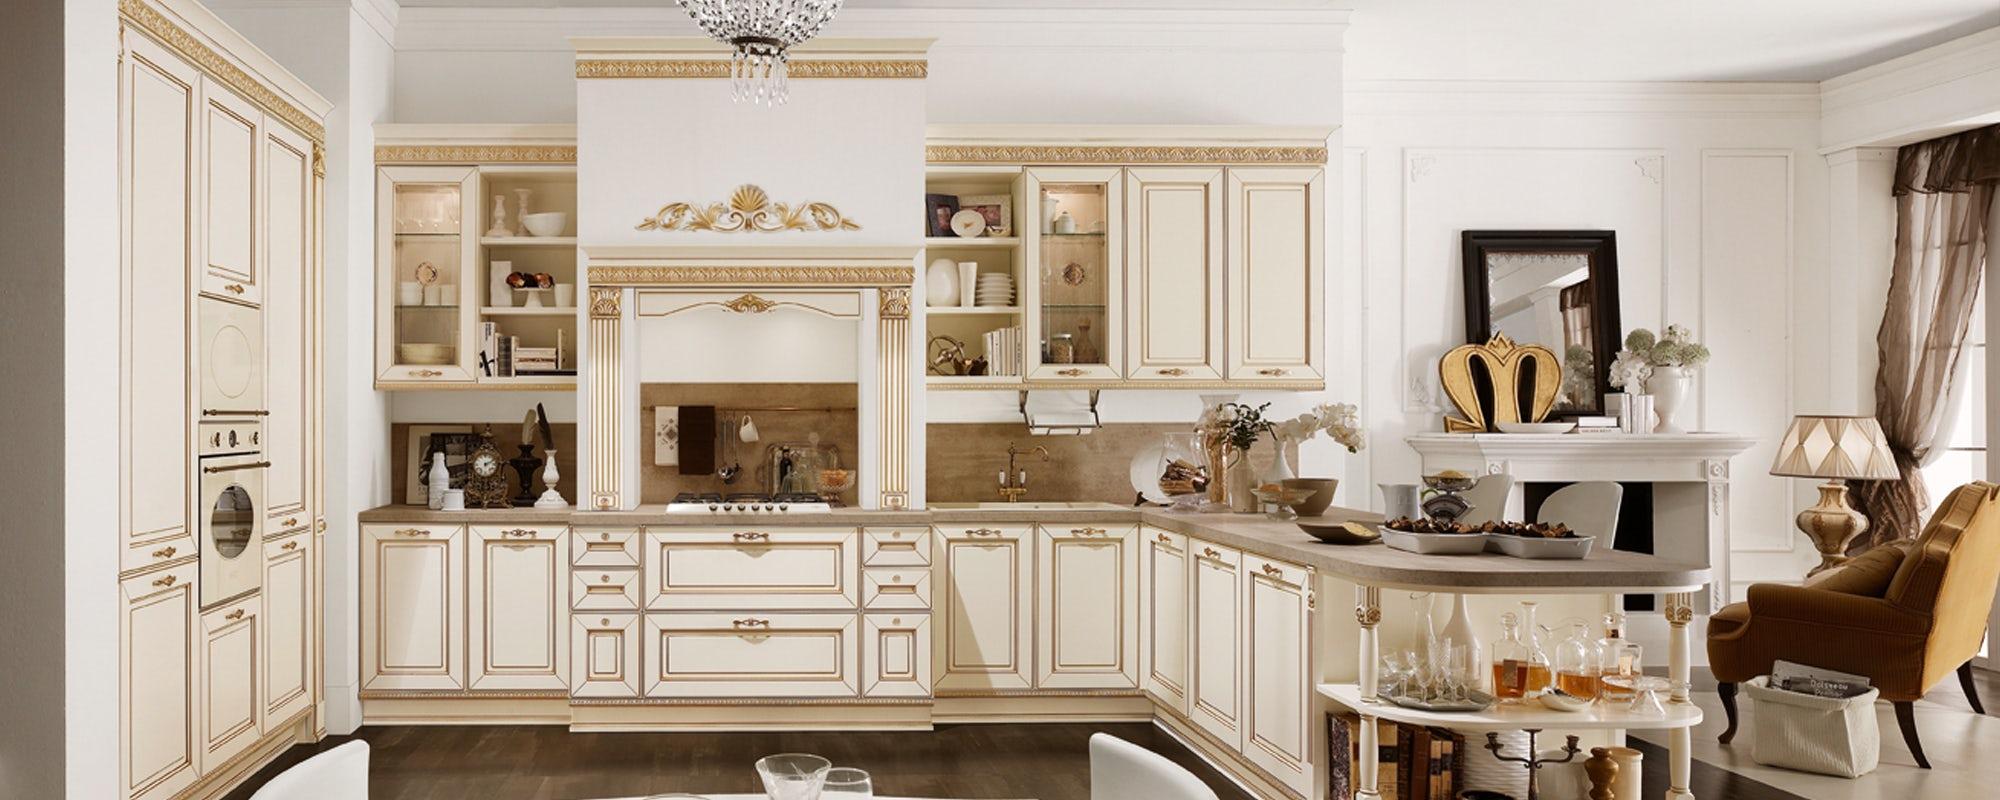 Cucina Stosa Dolcevita Lecce